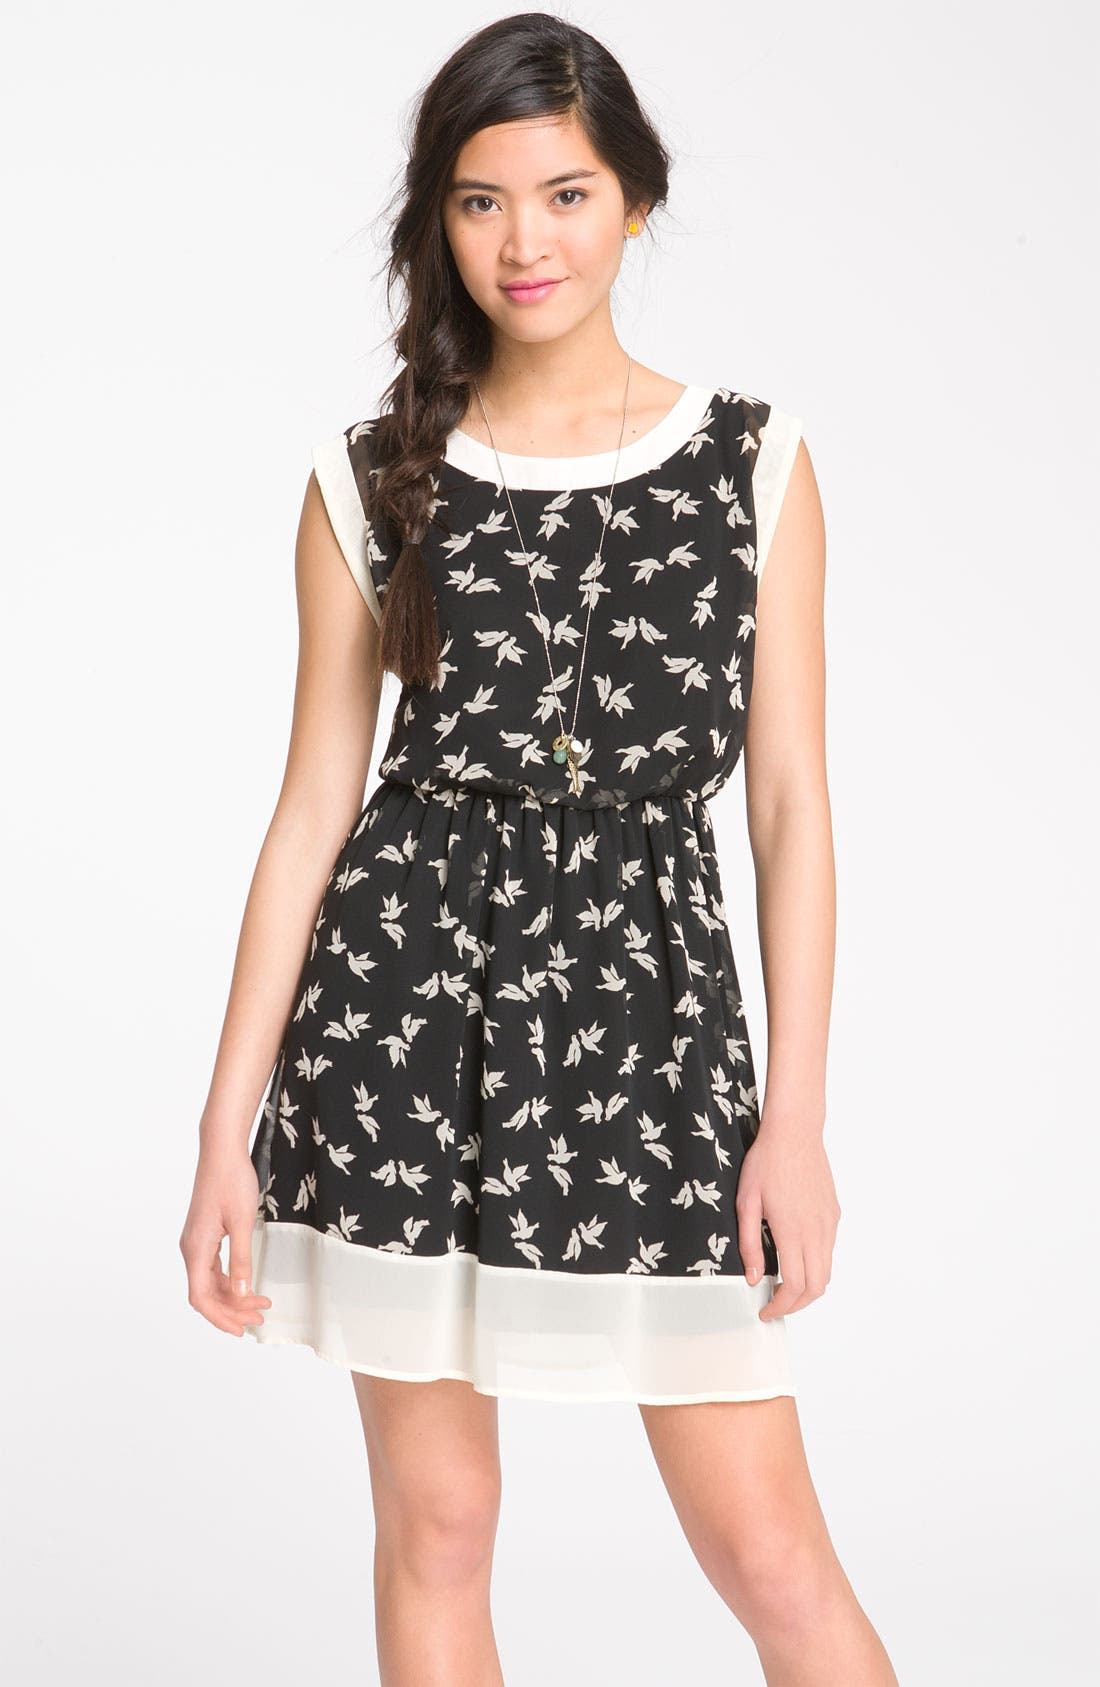 Alternate Image 1 Selected - Lush Print Chiffon Frame Dress (Juniors)